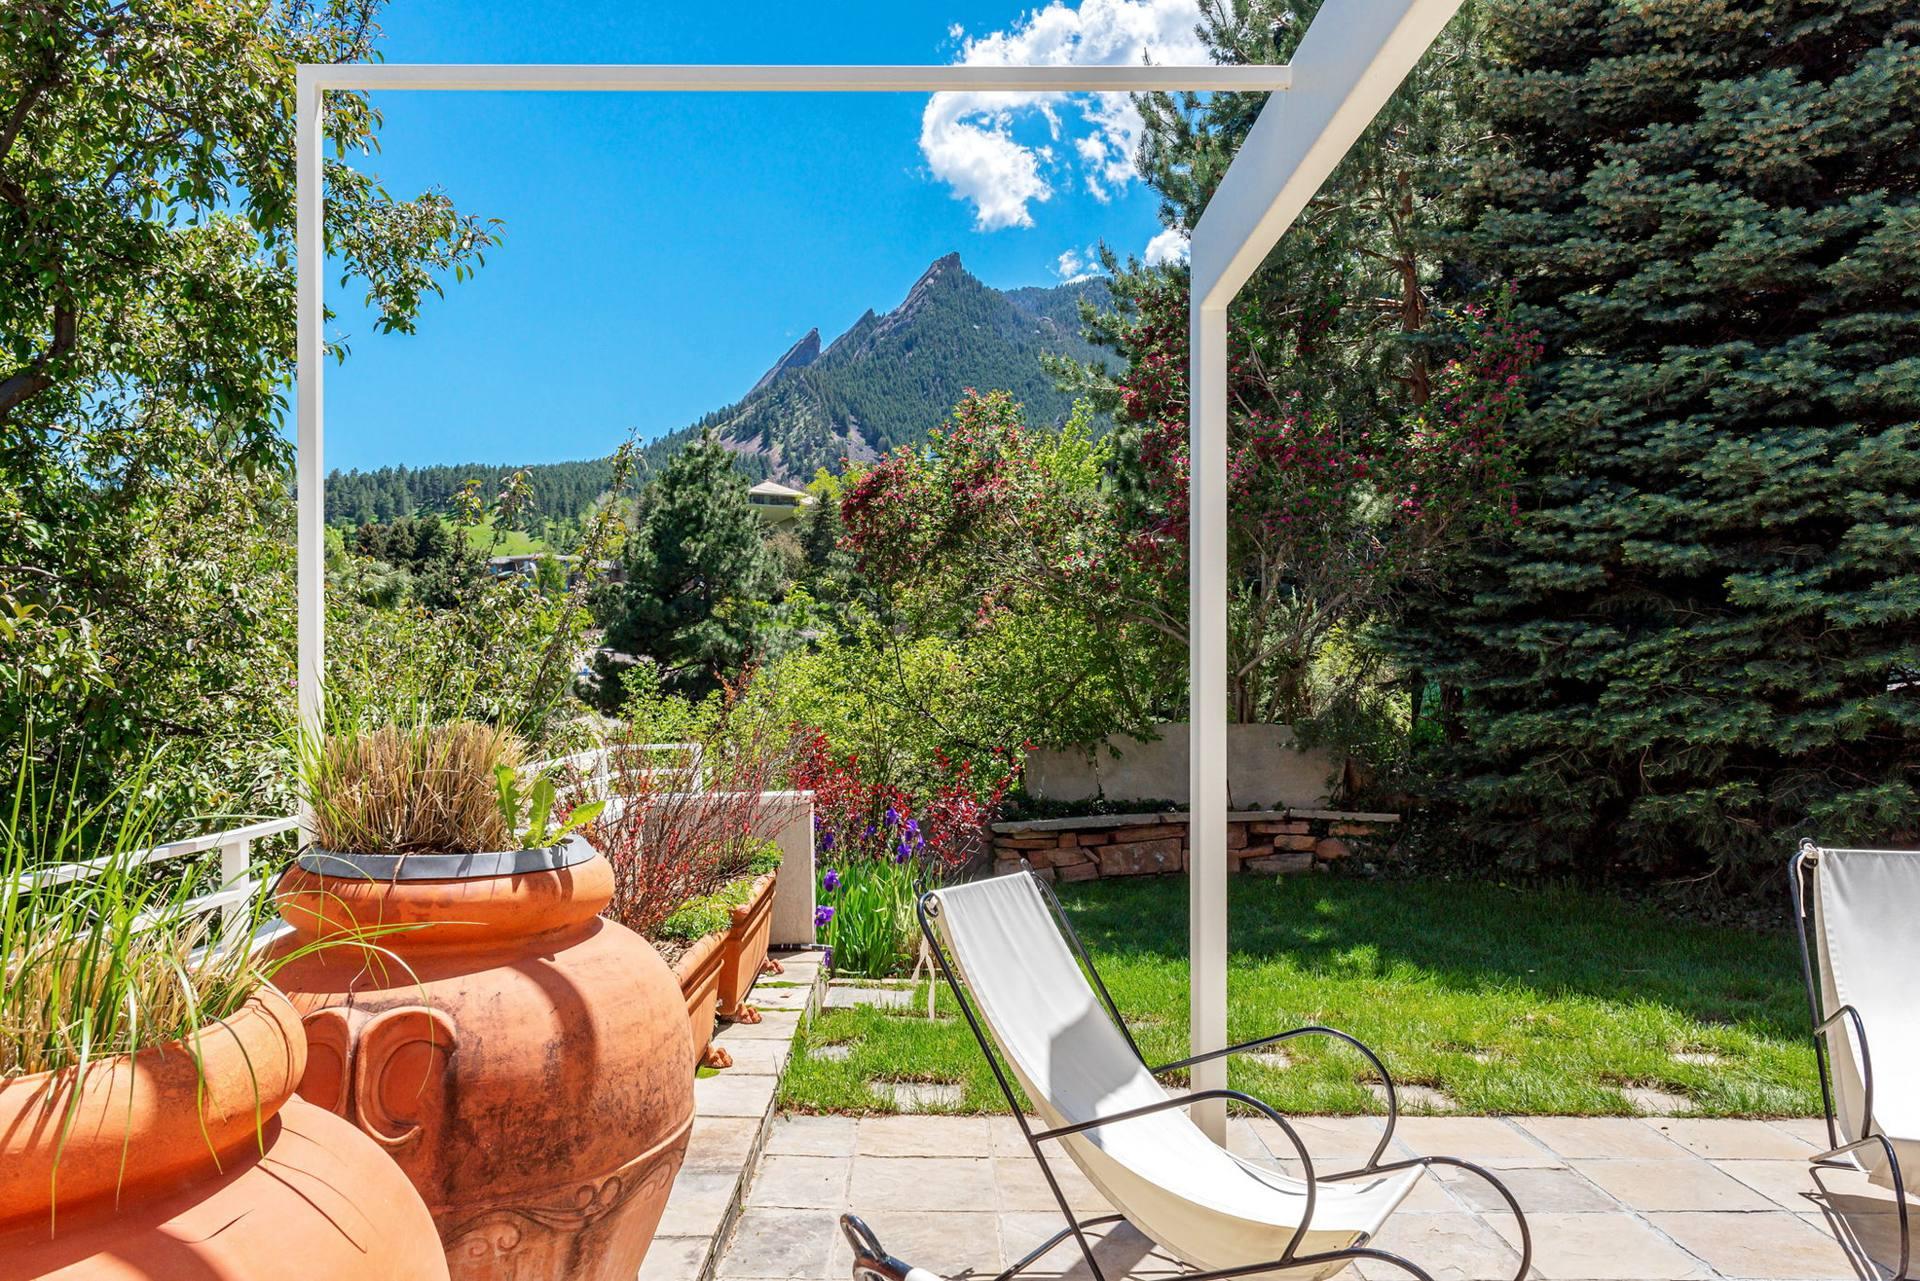 855 Circle Dr, Boulder, CO 80302, US